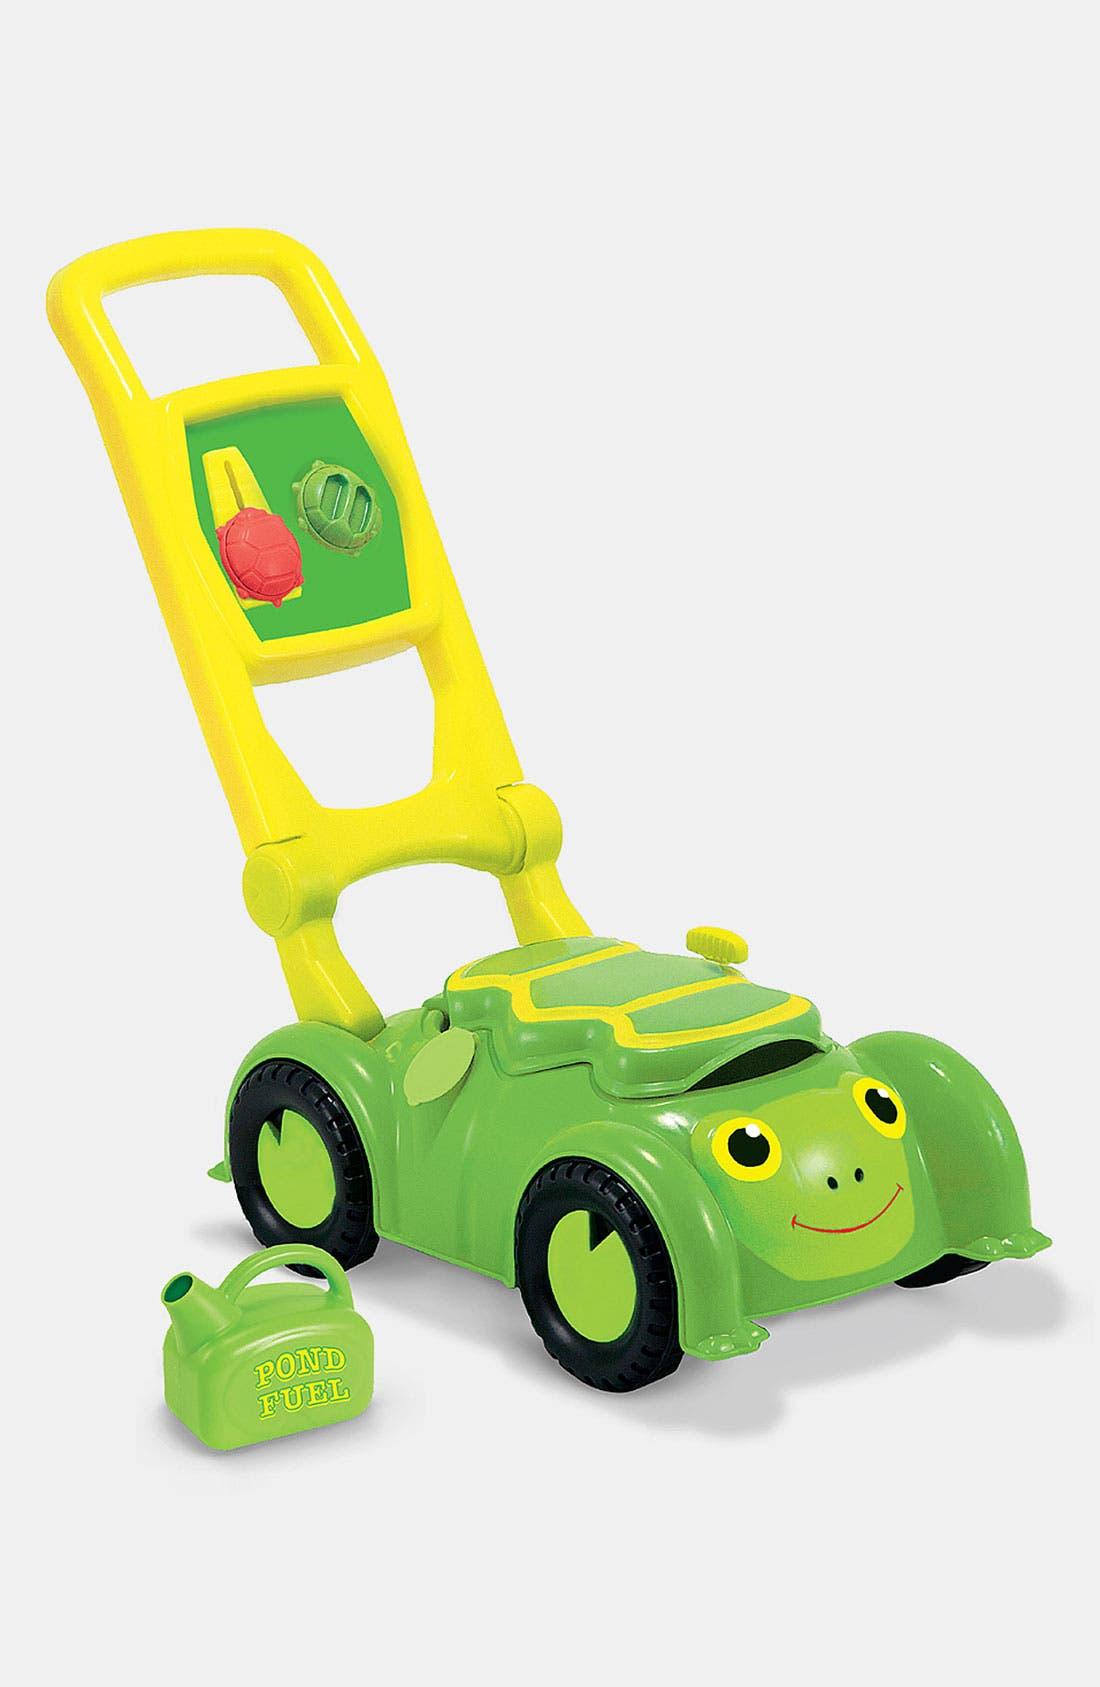 Main Image - Melissa & Doug 'Tootle Turtle' Lawn Mower Toy